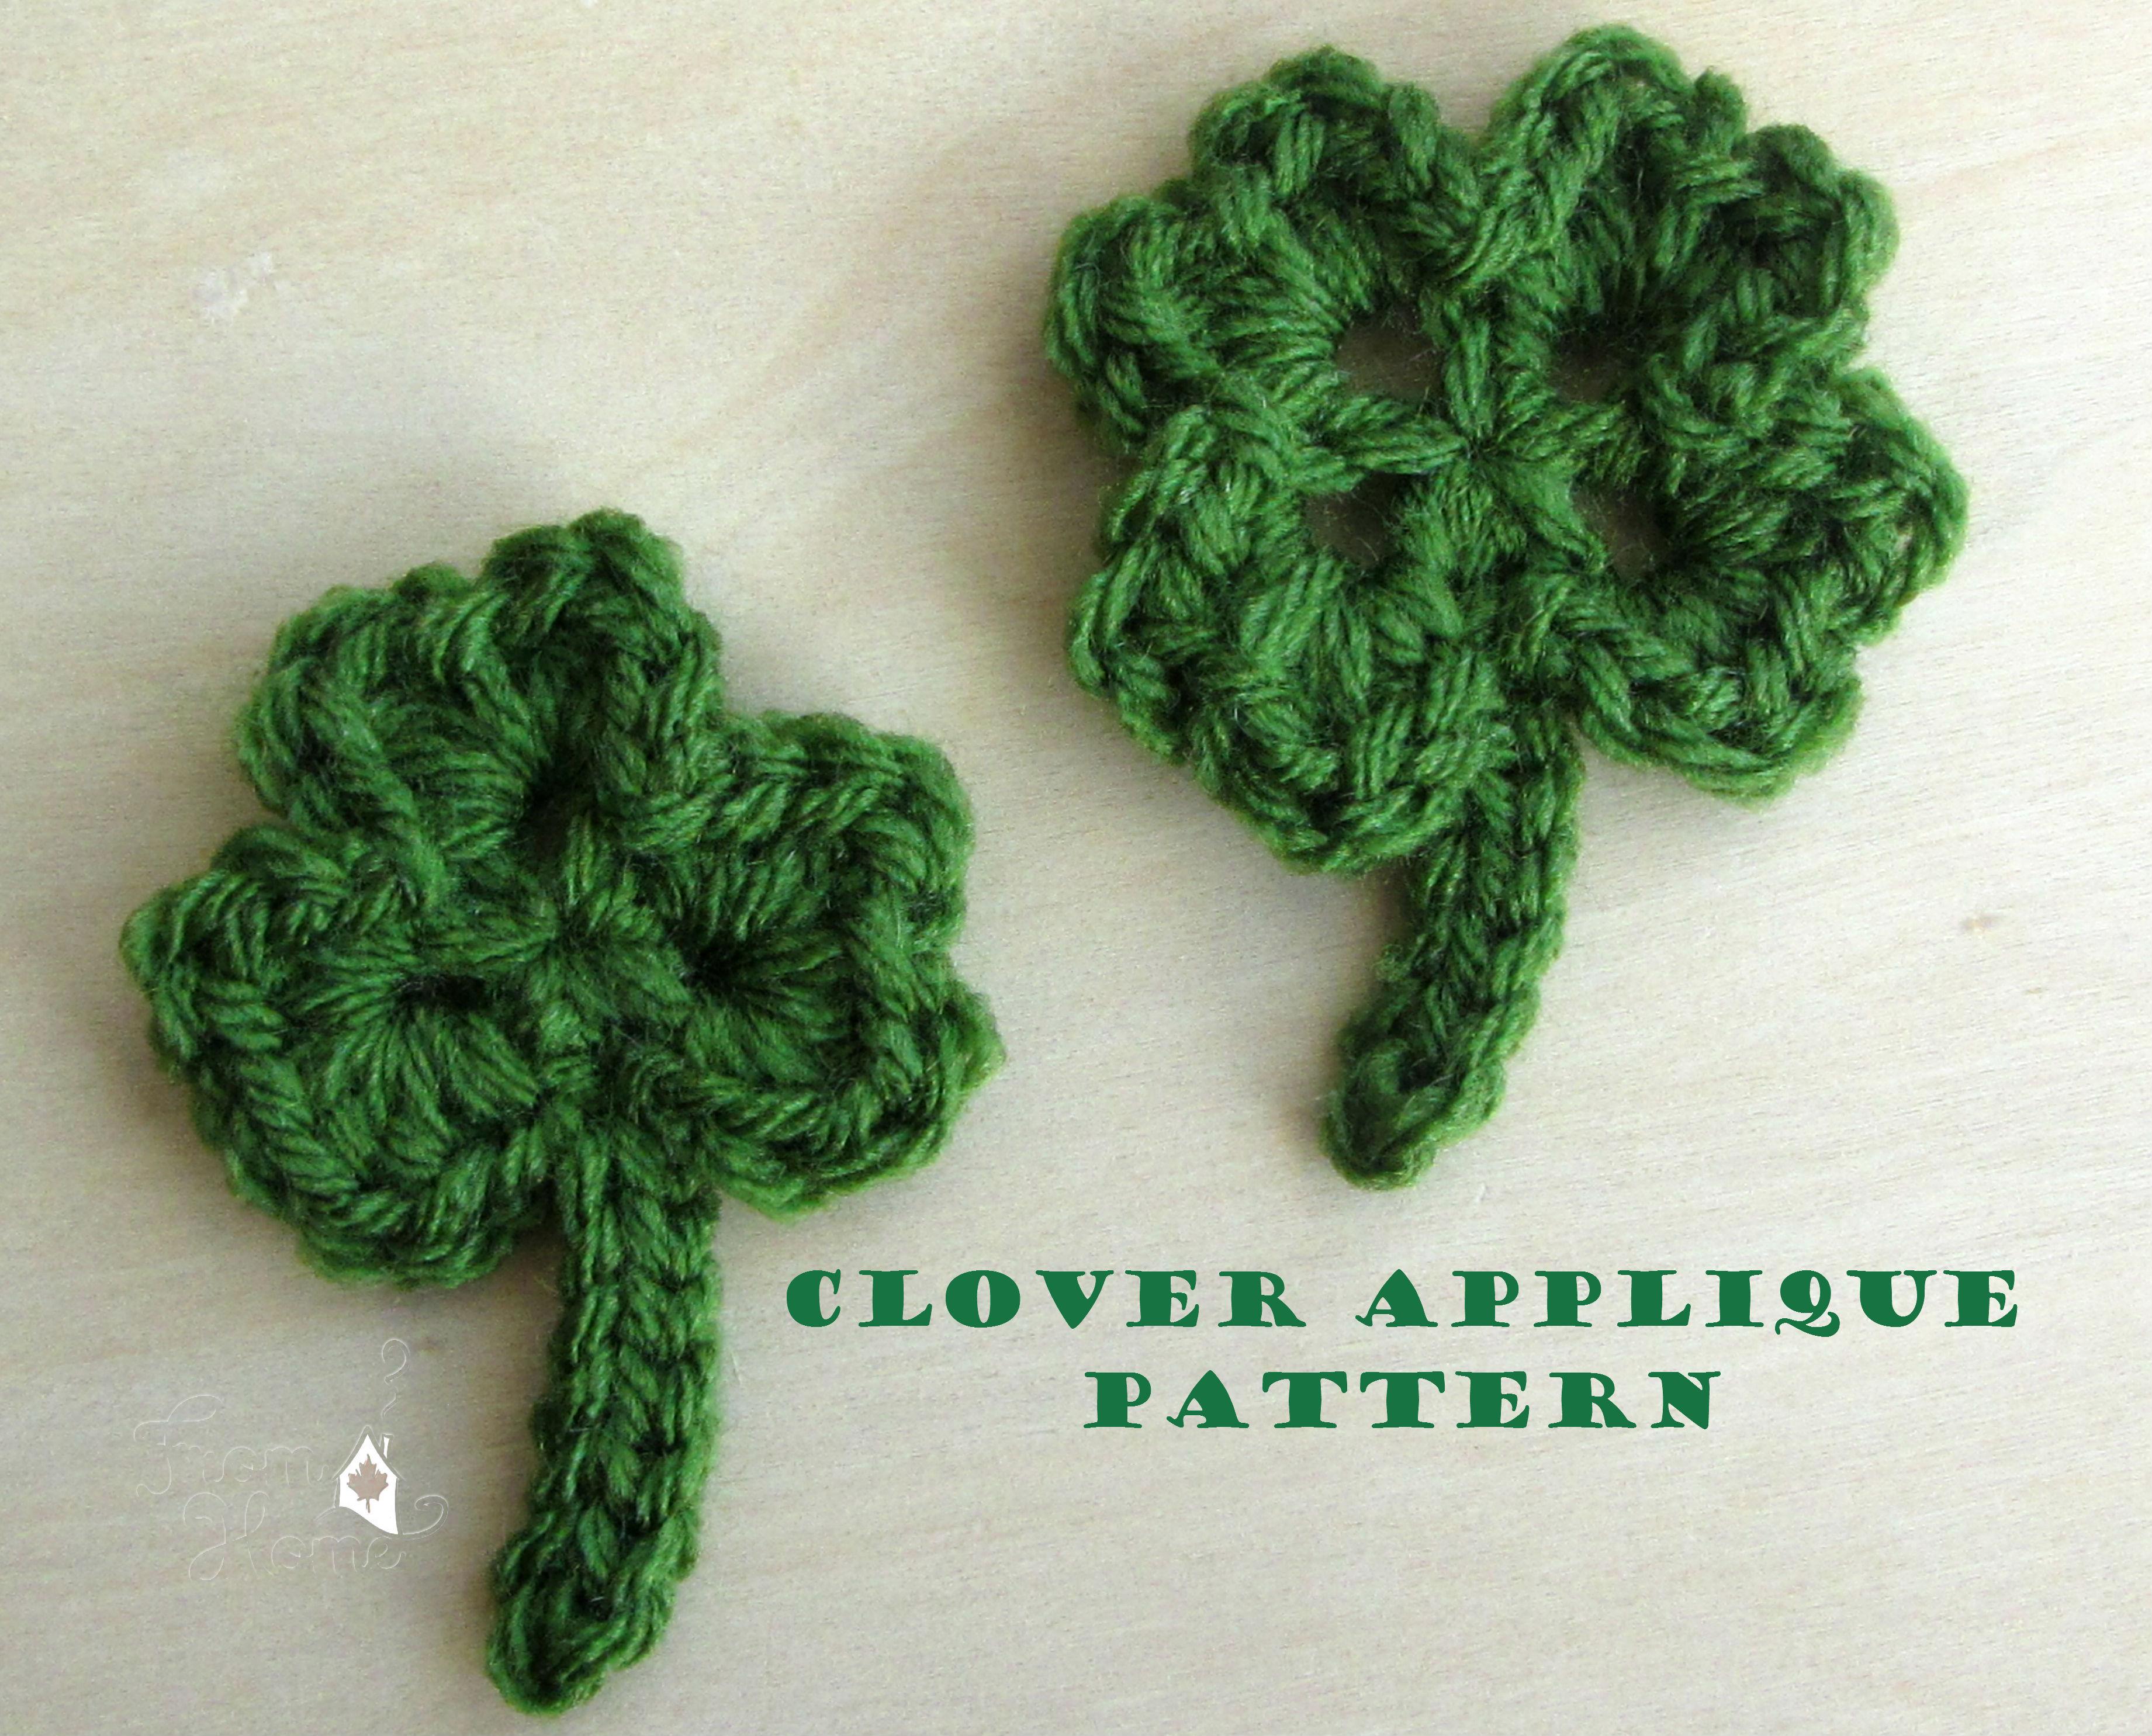 Cloverapplique